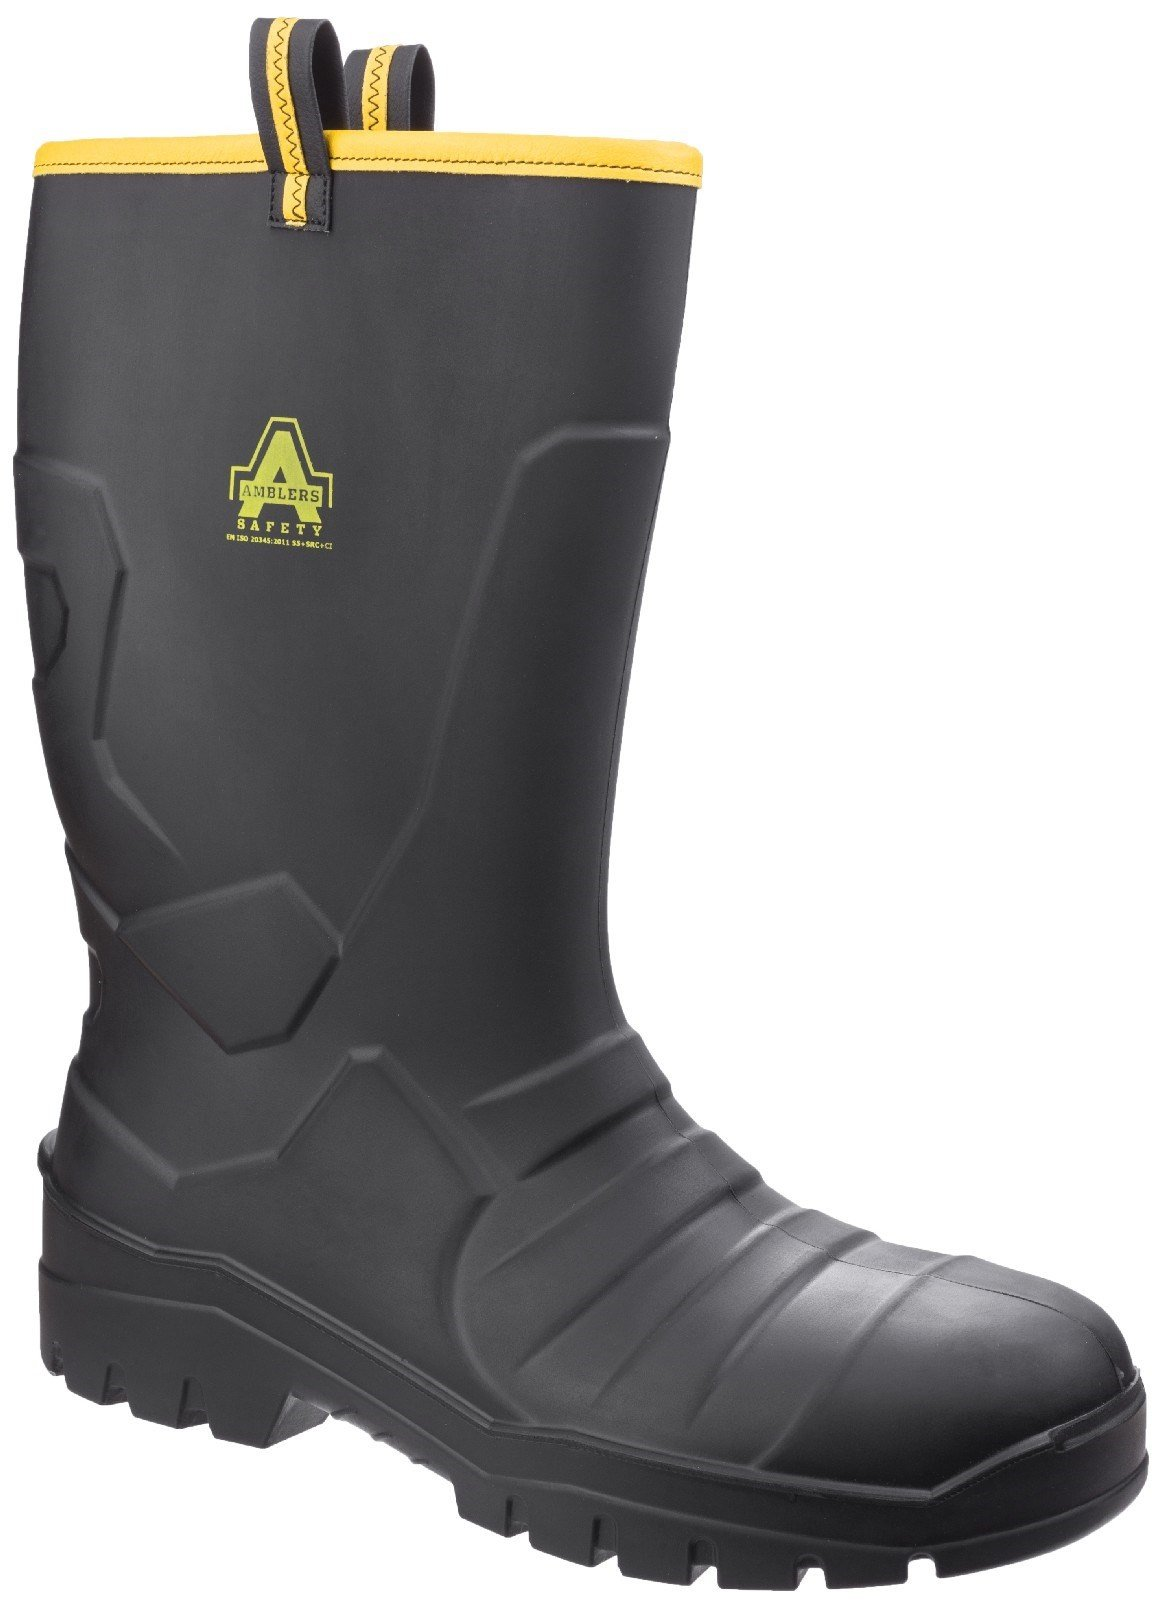 Amblers Unisex Safety Full Rigger Boot Black 27041 - Black 3